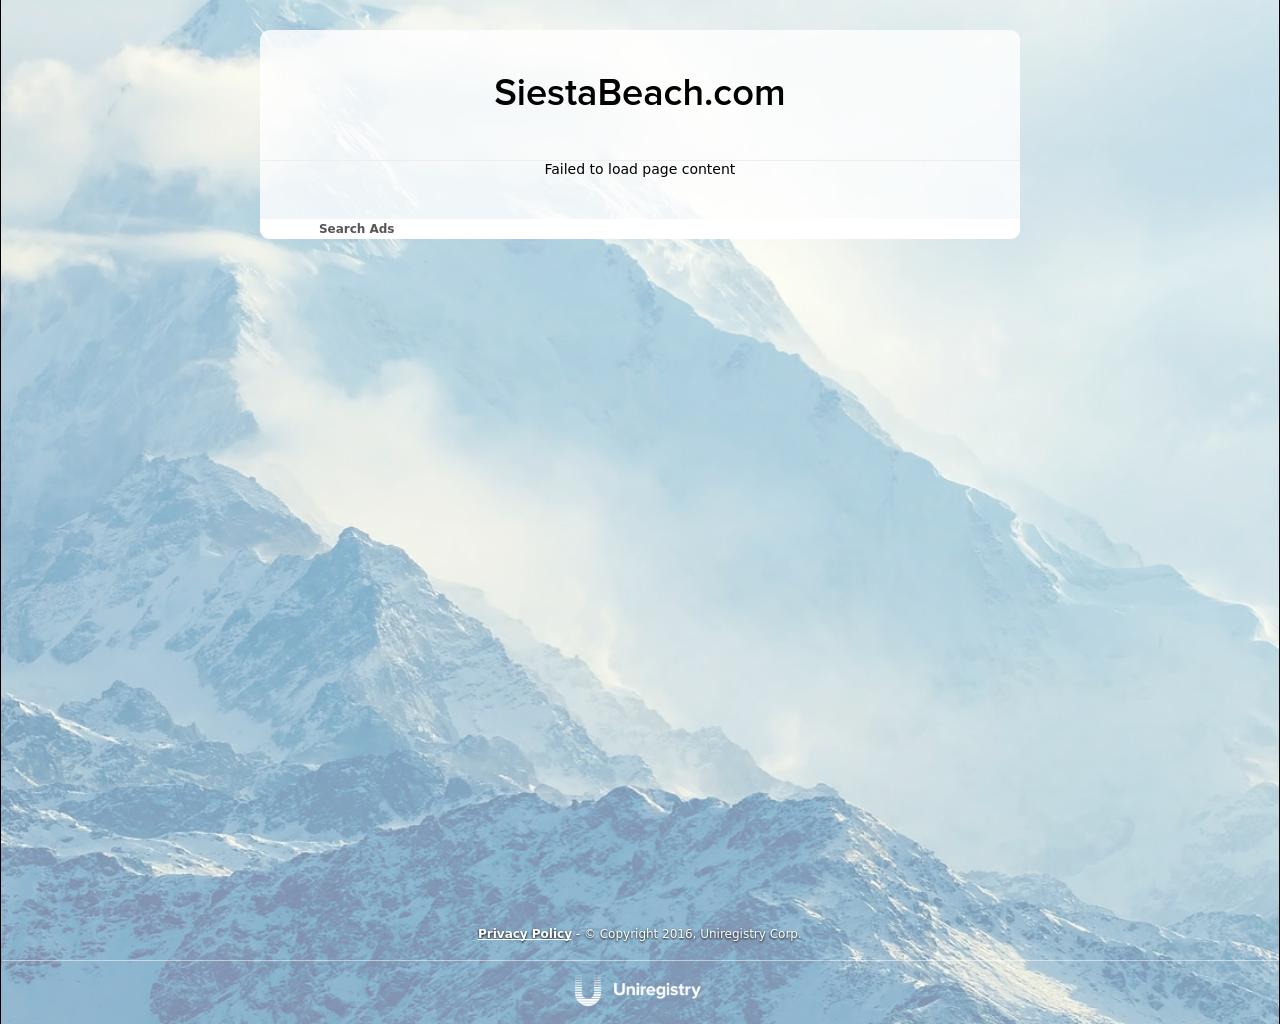 Siestabeach.com-Advertising-Reviews-Pricing